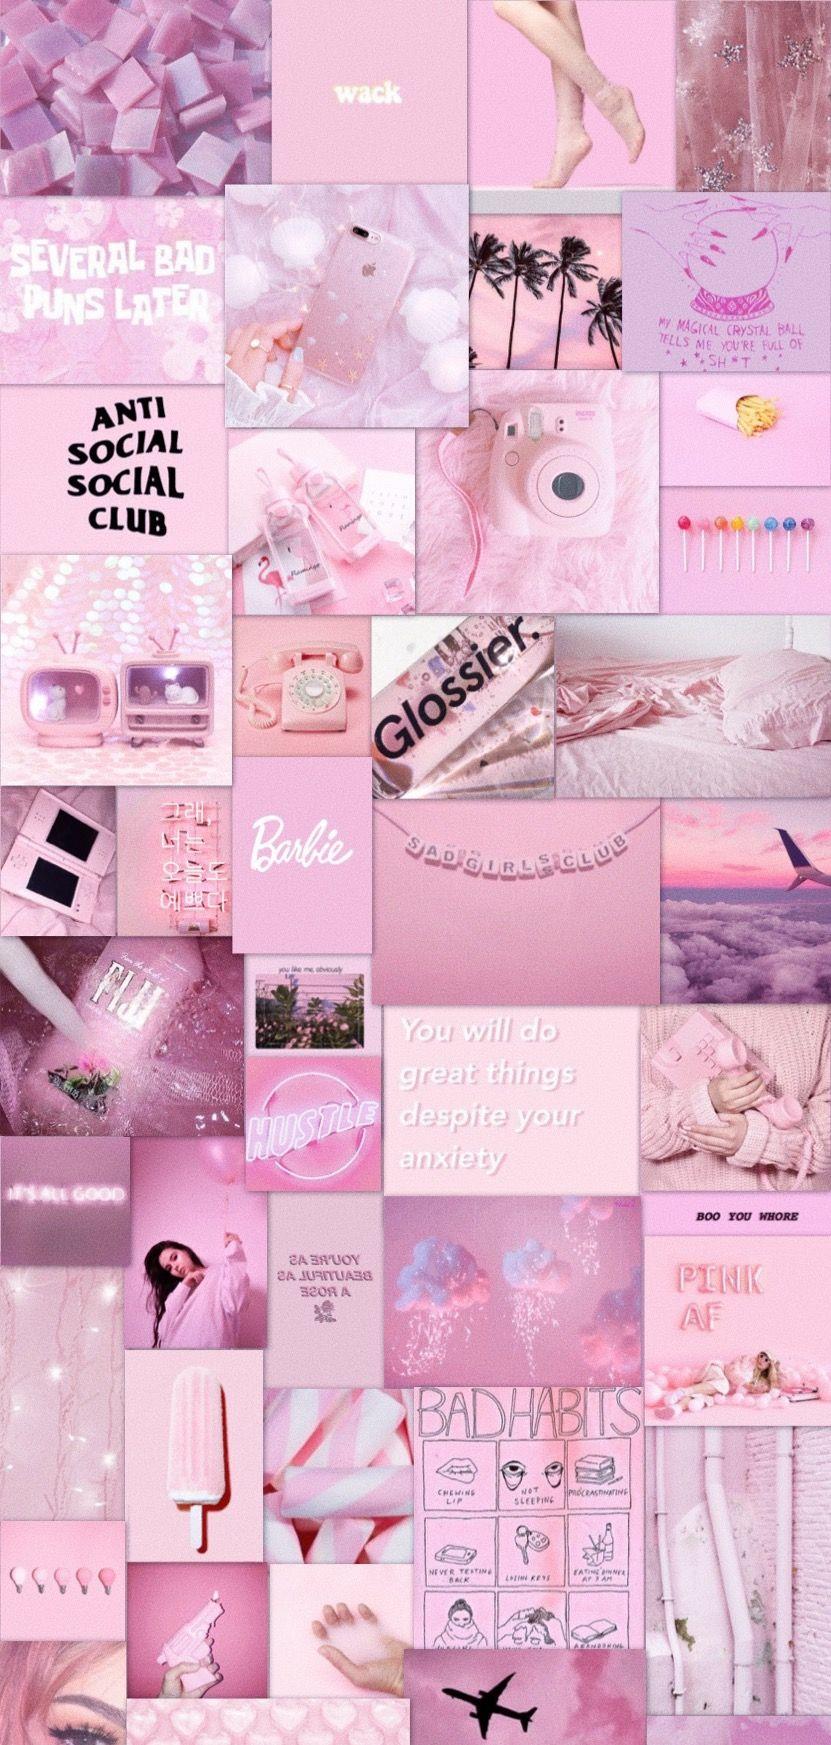 Pink Aesthetic In 2020 Iphone Wallpaper Vintage Pretty Wallpaper Iphone Pink Aesthetic